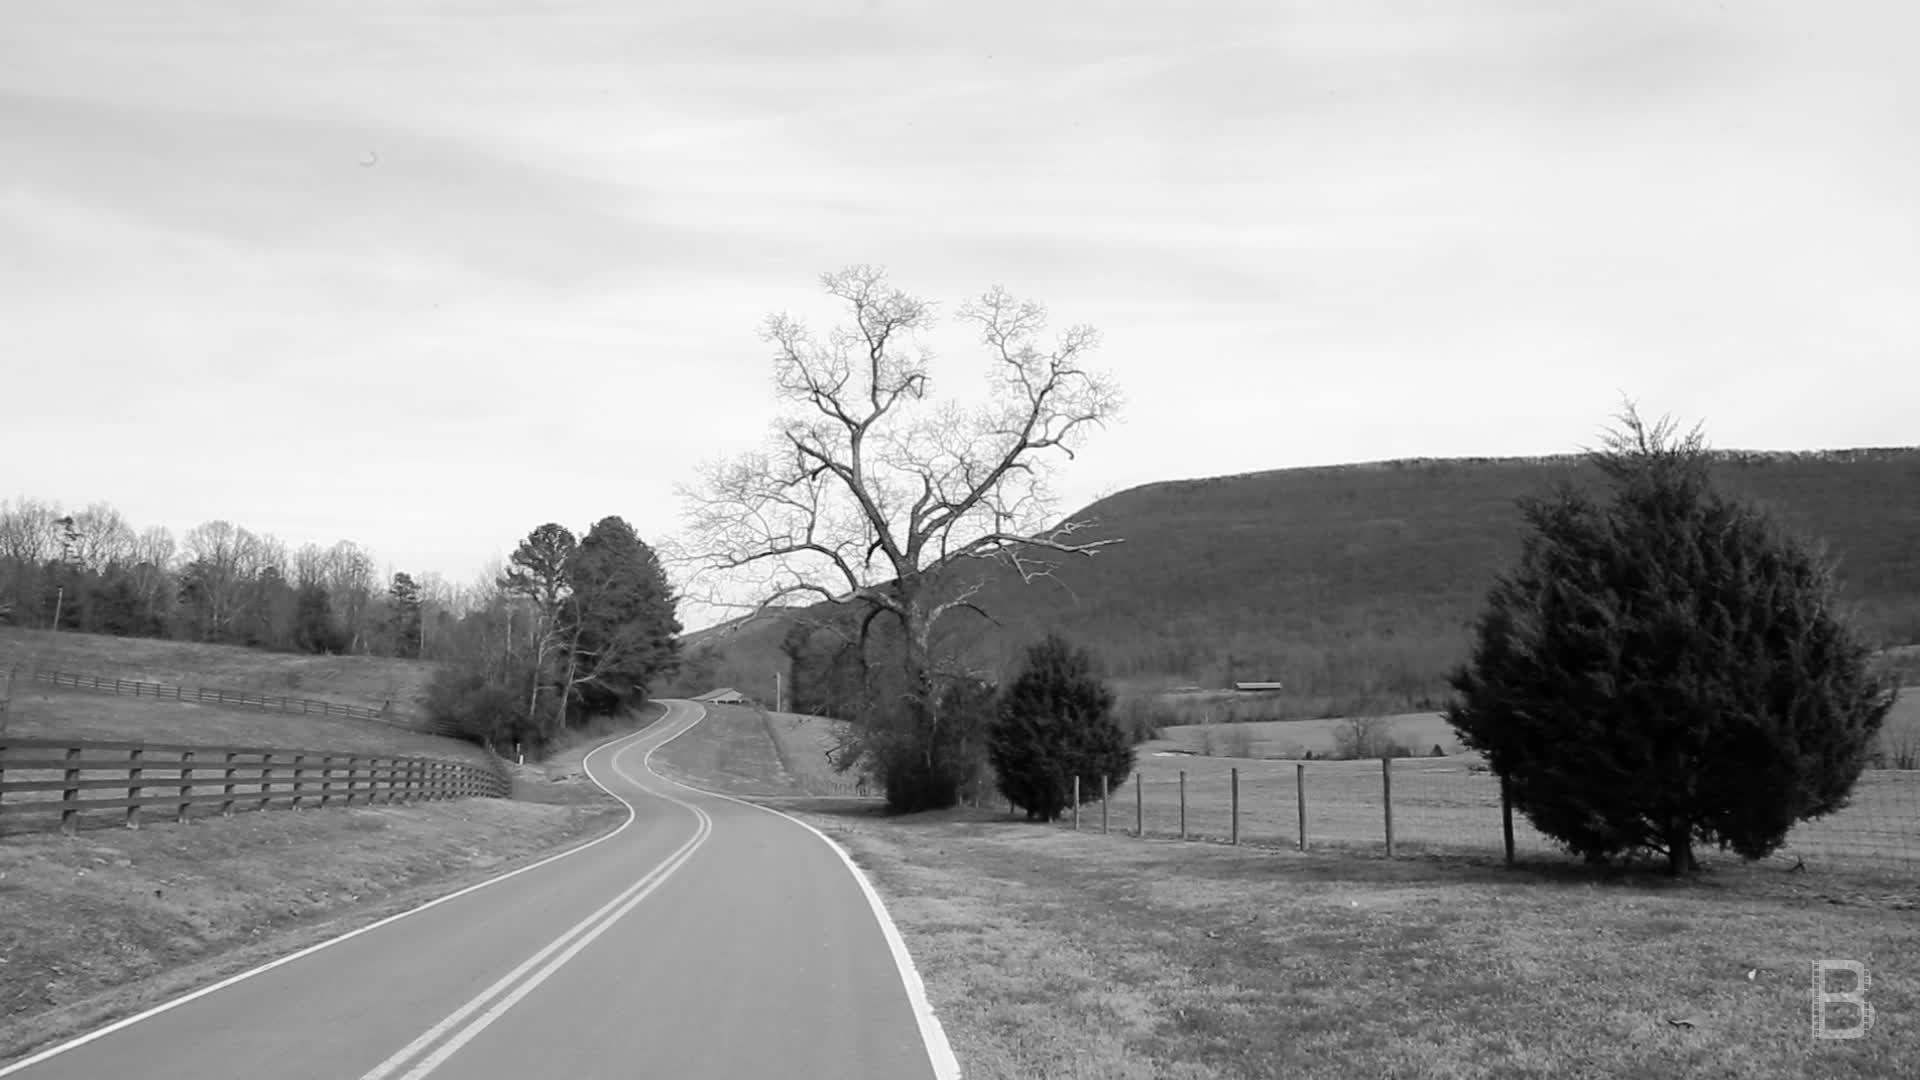 BELLA Presents: daily bello S1 Ep113 Calmness in a Rural Road